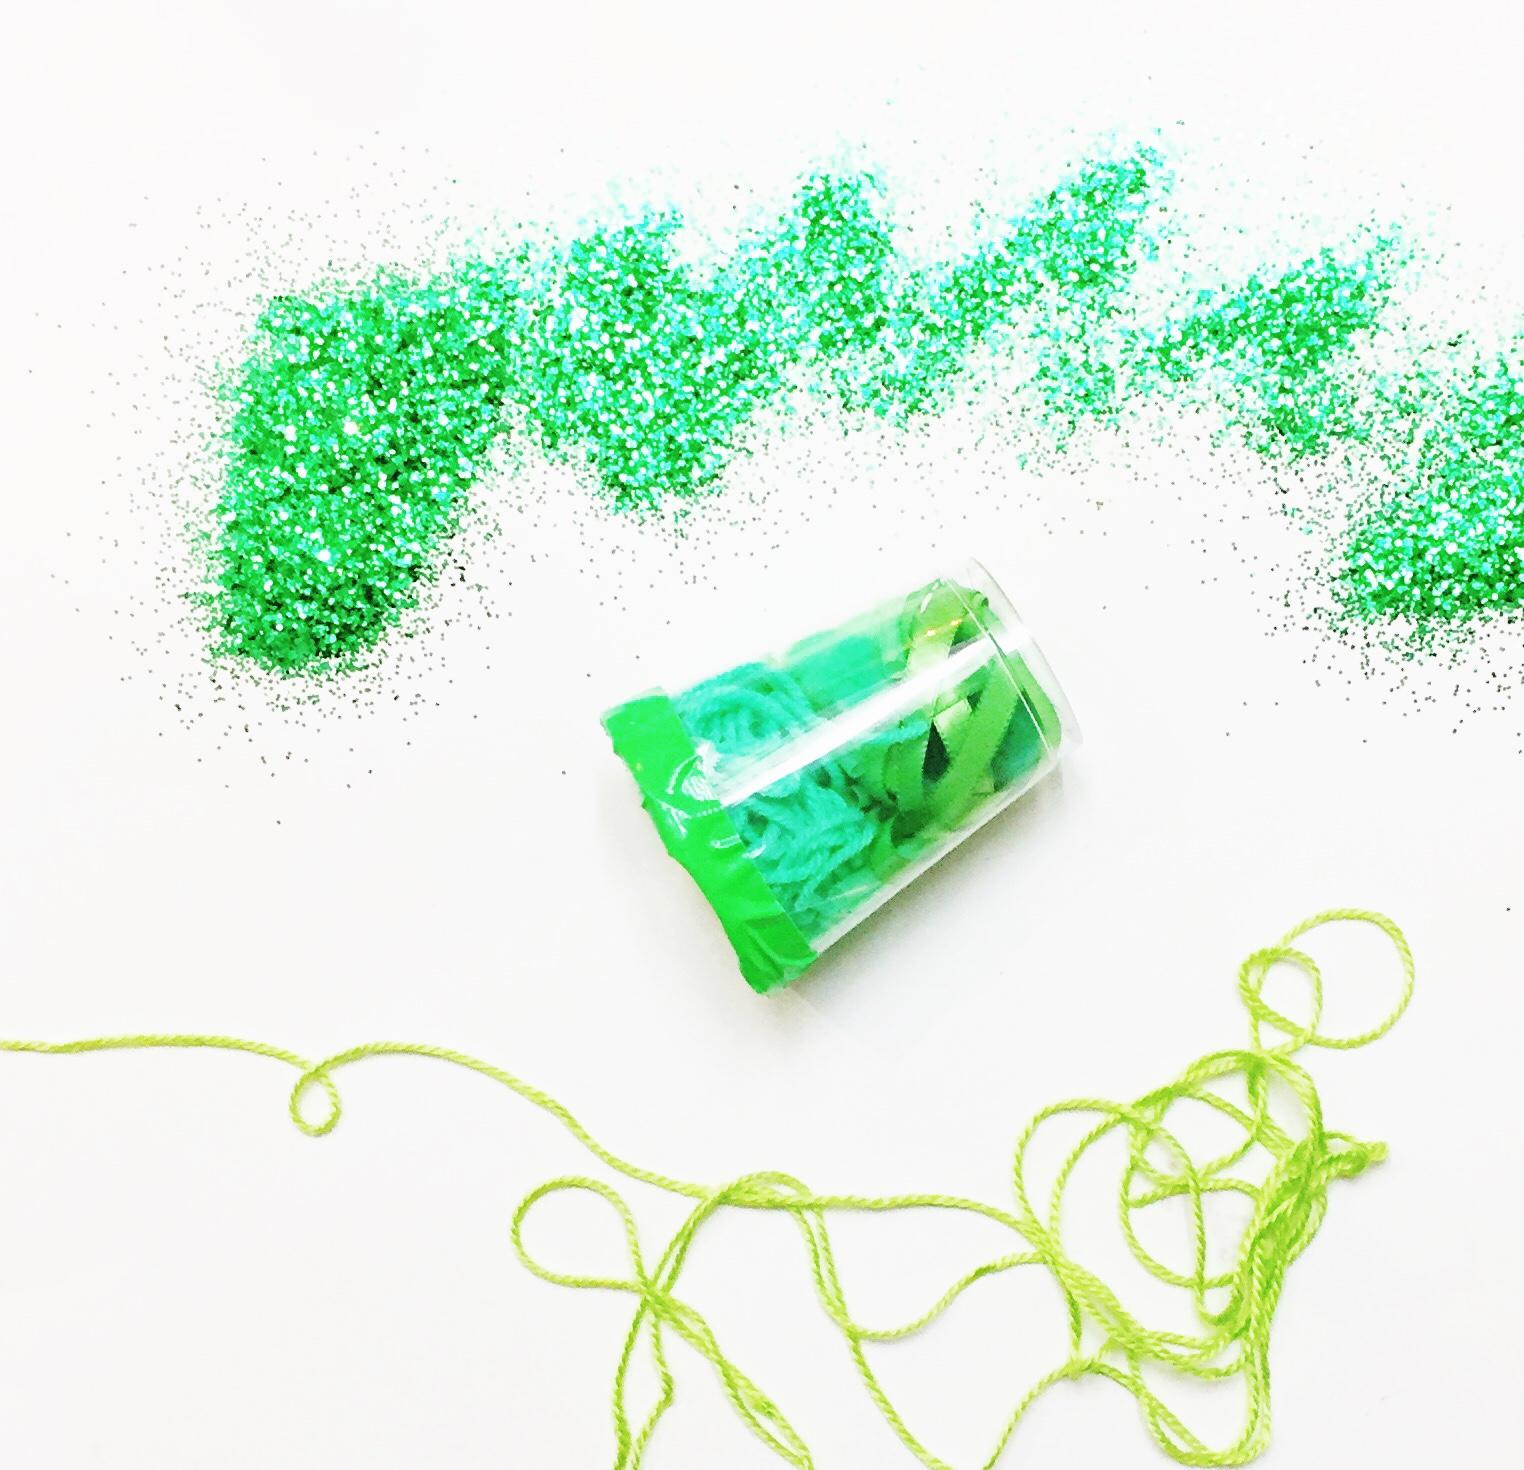 green sensory diy toy for babies